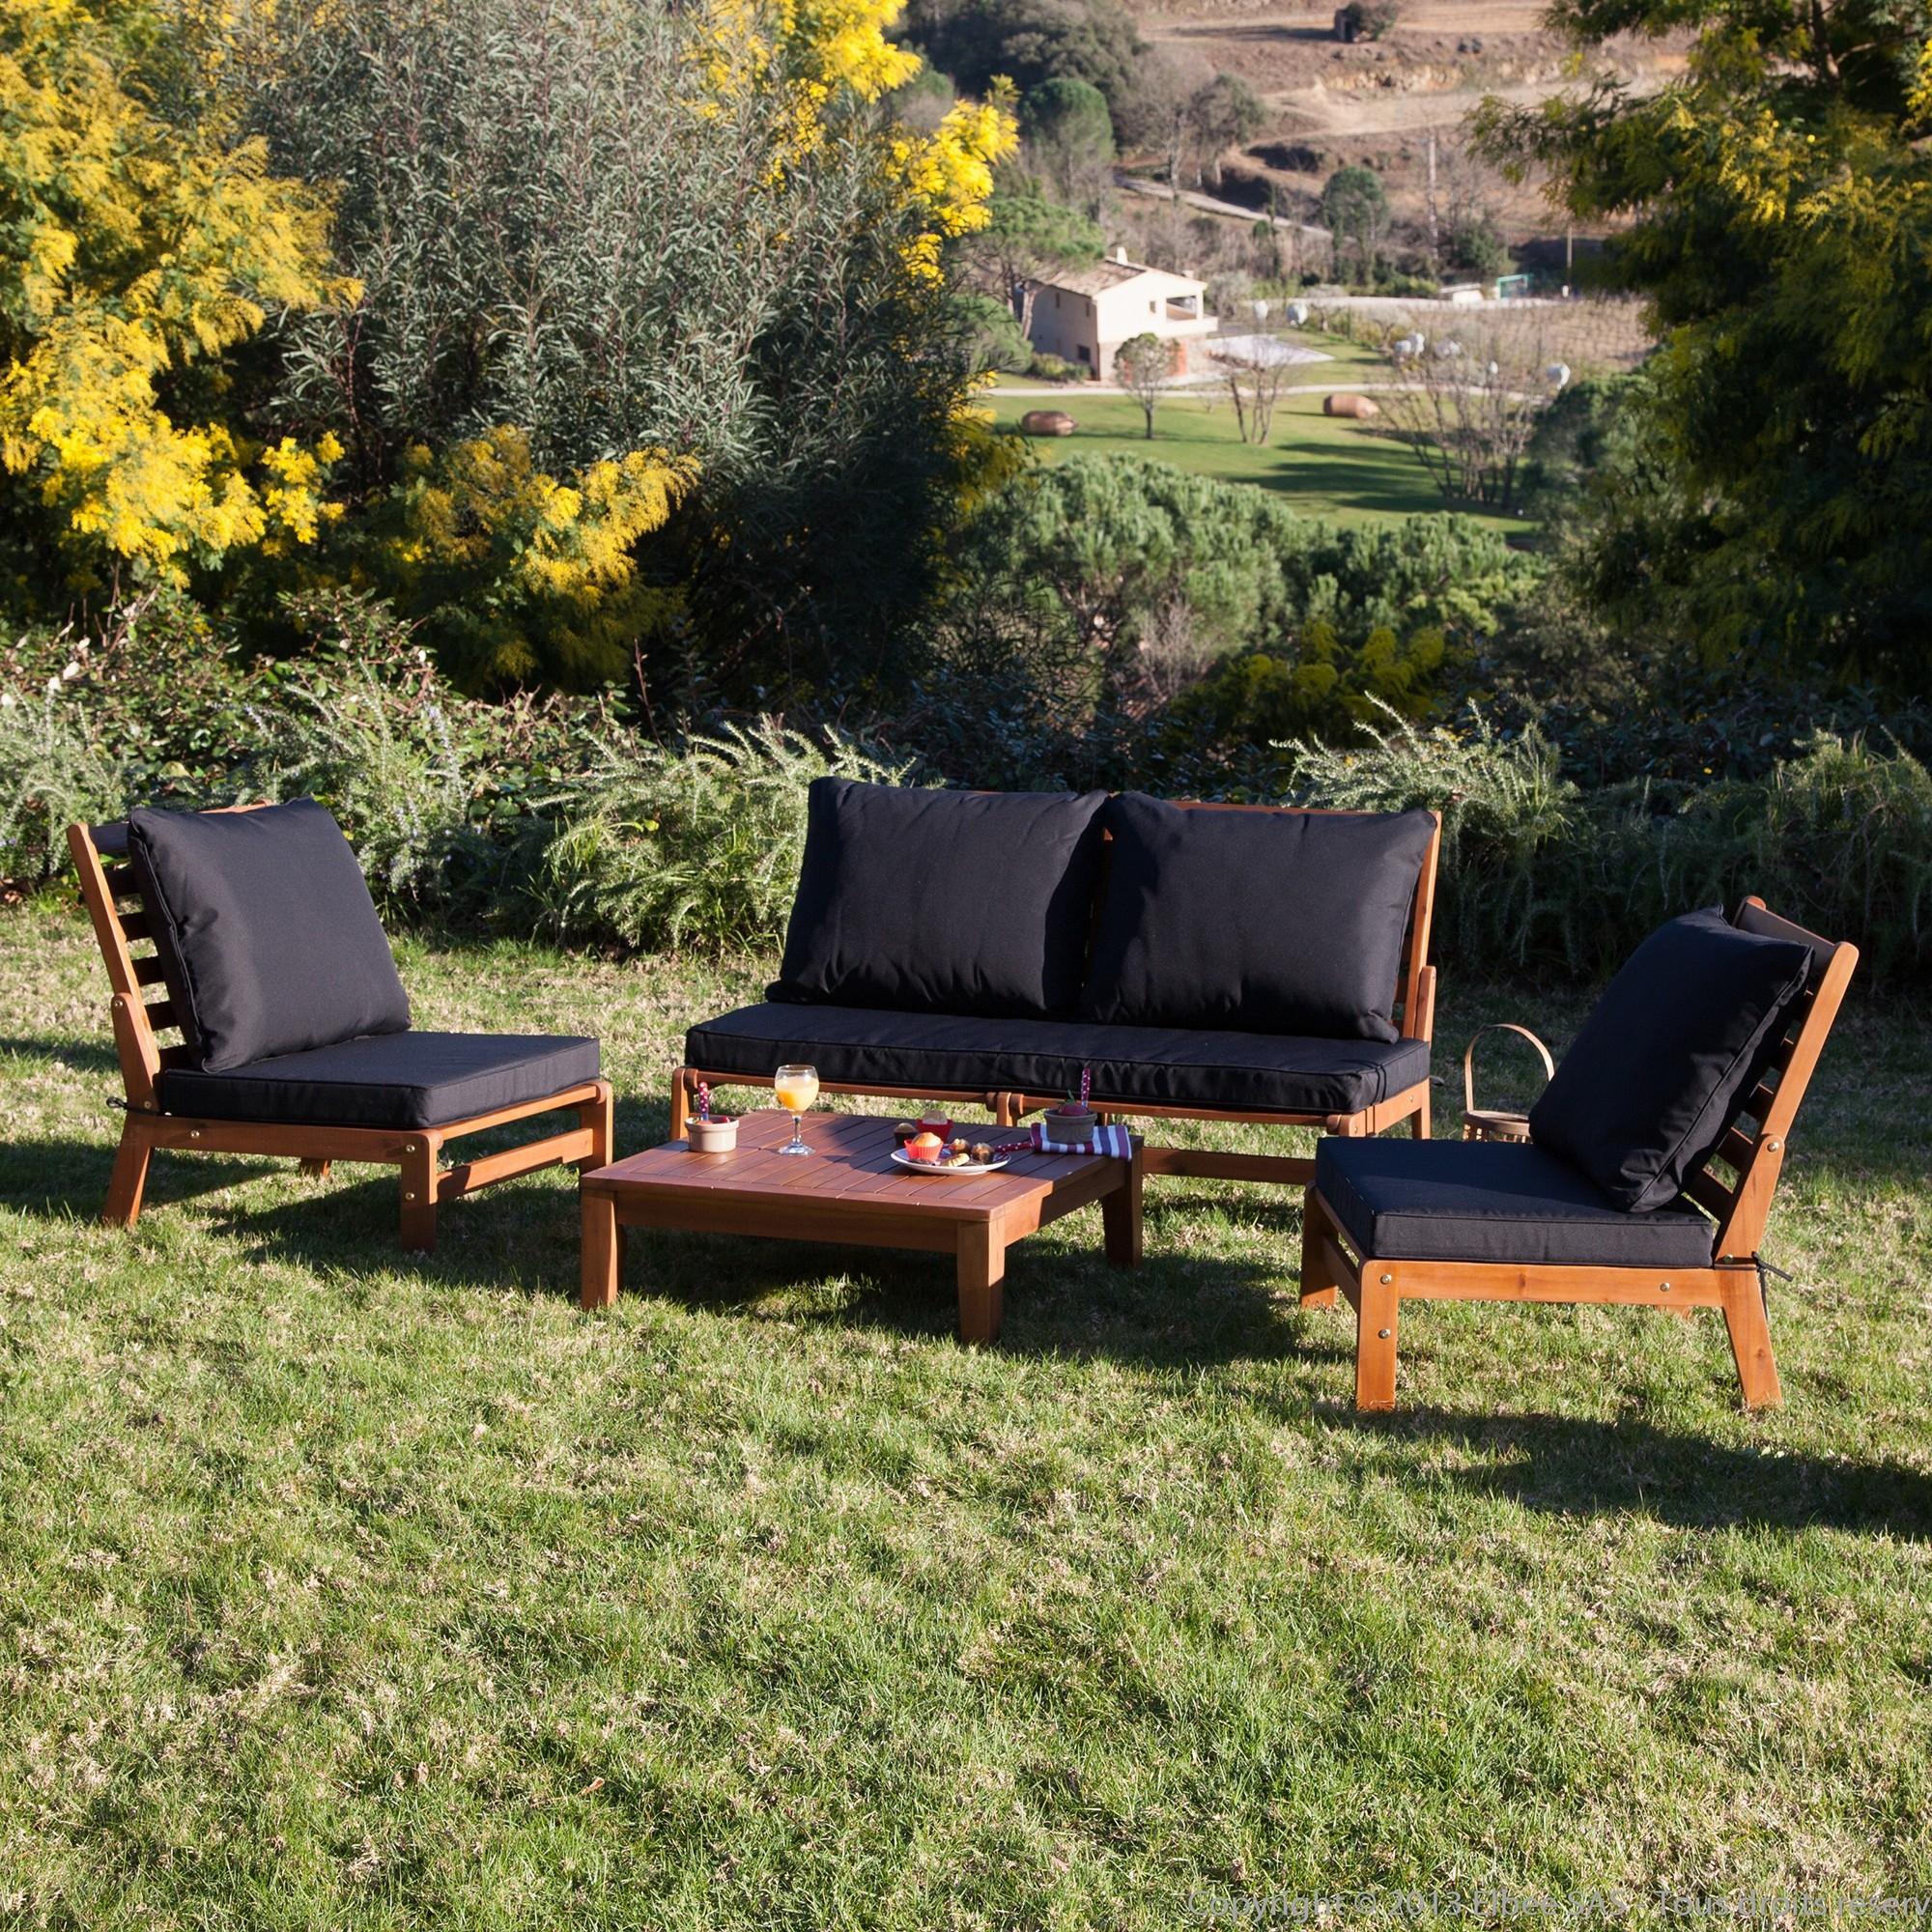 Chaises Jardin Castorama Élégant Stock Chaise Pliante De Jardin Luxe Castorama Chaise De Jardin S